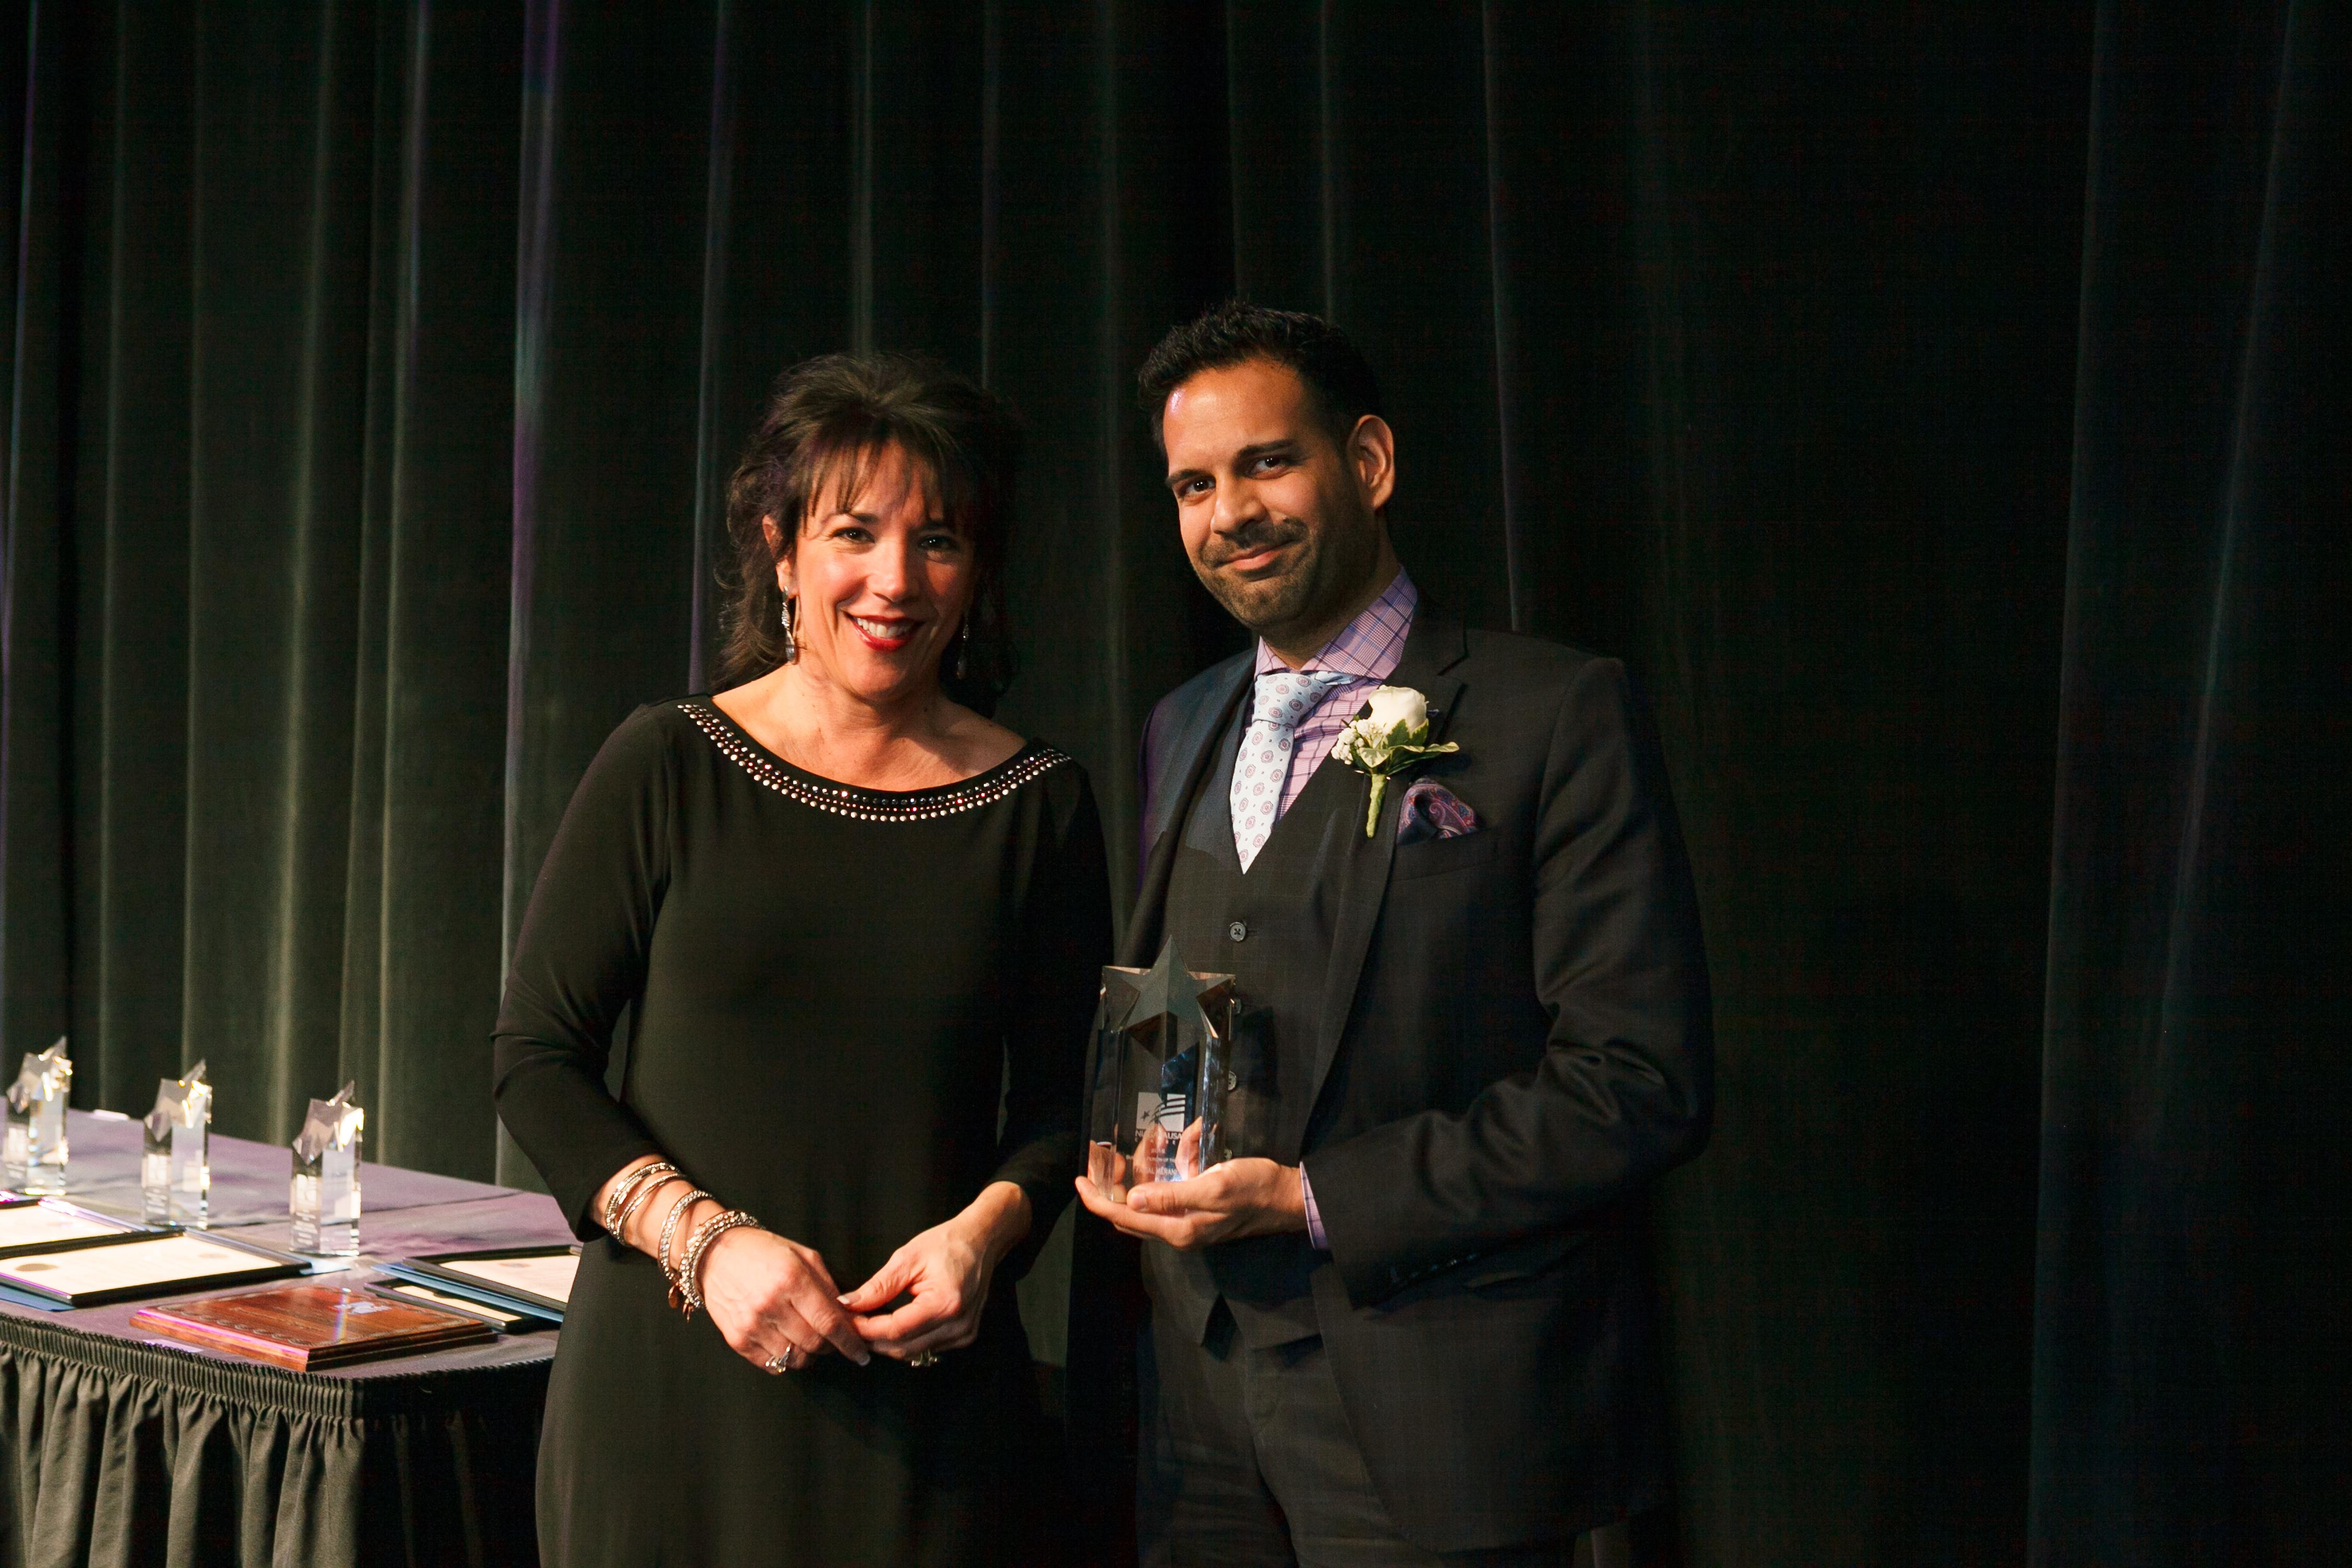 Niagara USA Chamber President & CEO Deanna Alterio Brennen & Faisal Merani, 2015 Business Person of the Year